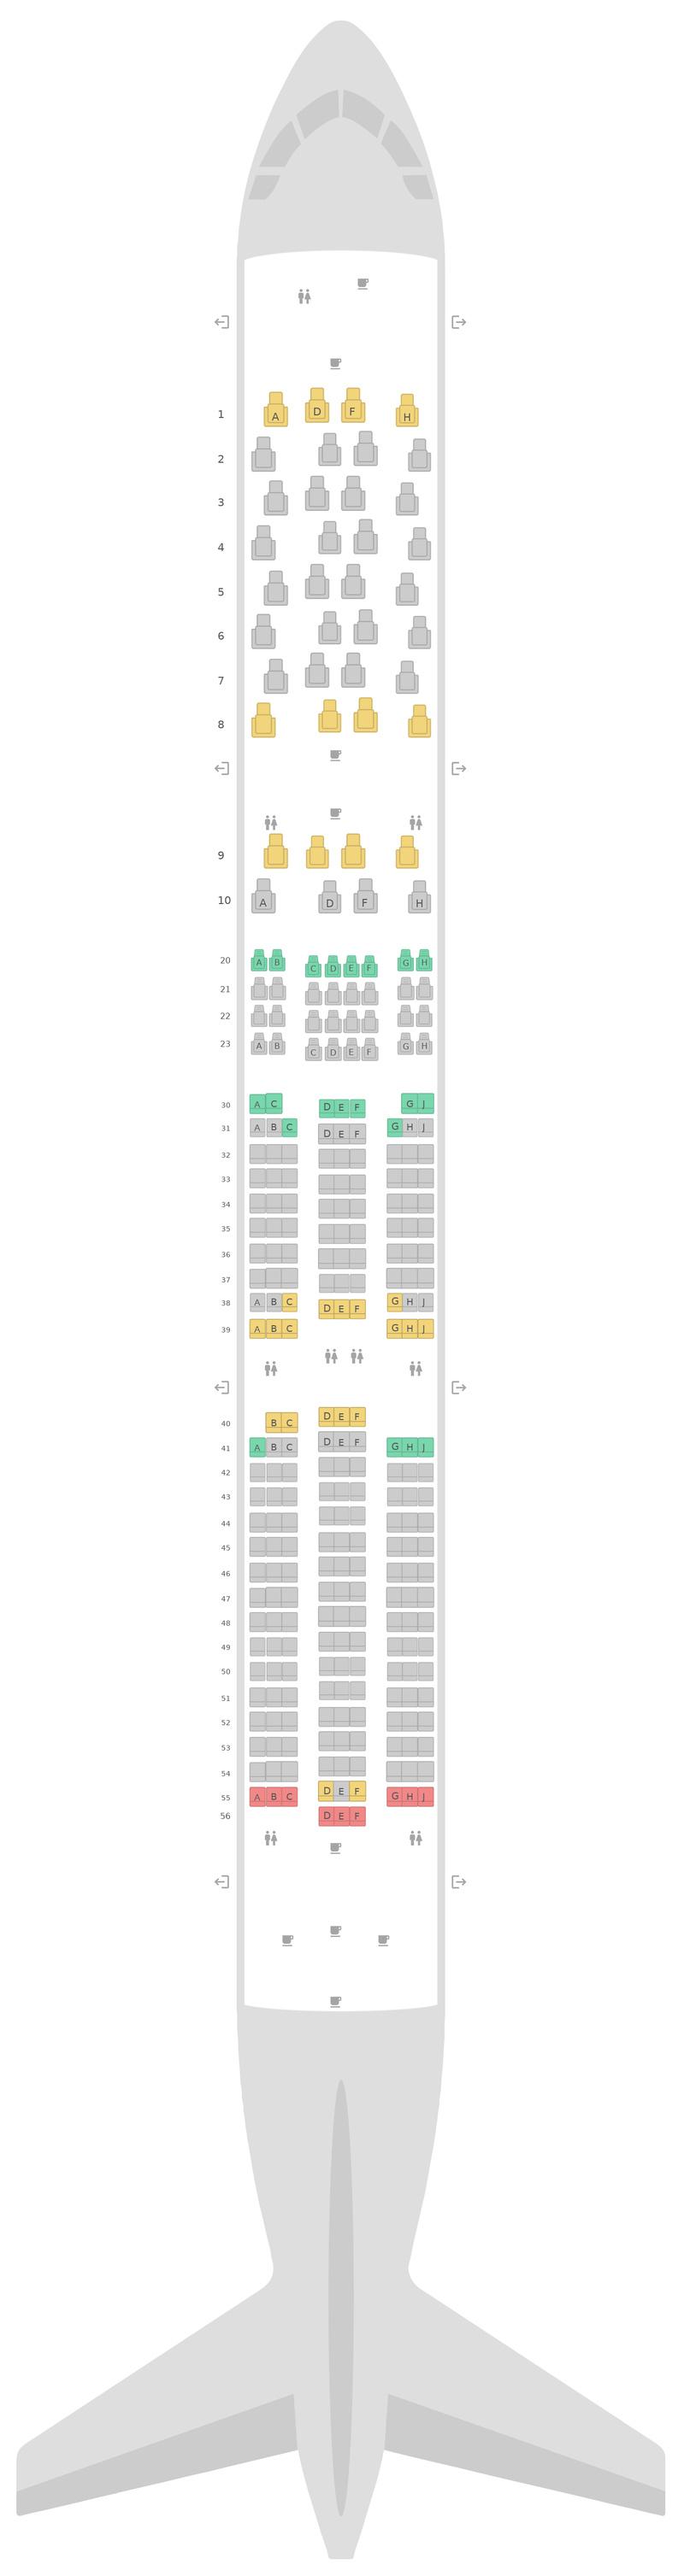 Sitzplan Airbus A350-900 (359) Scandinavian Airlines (SAS)